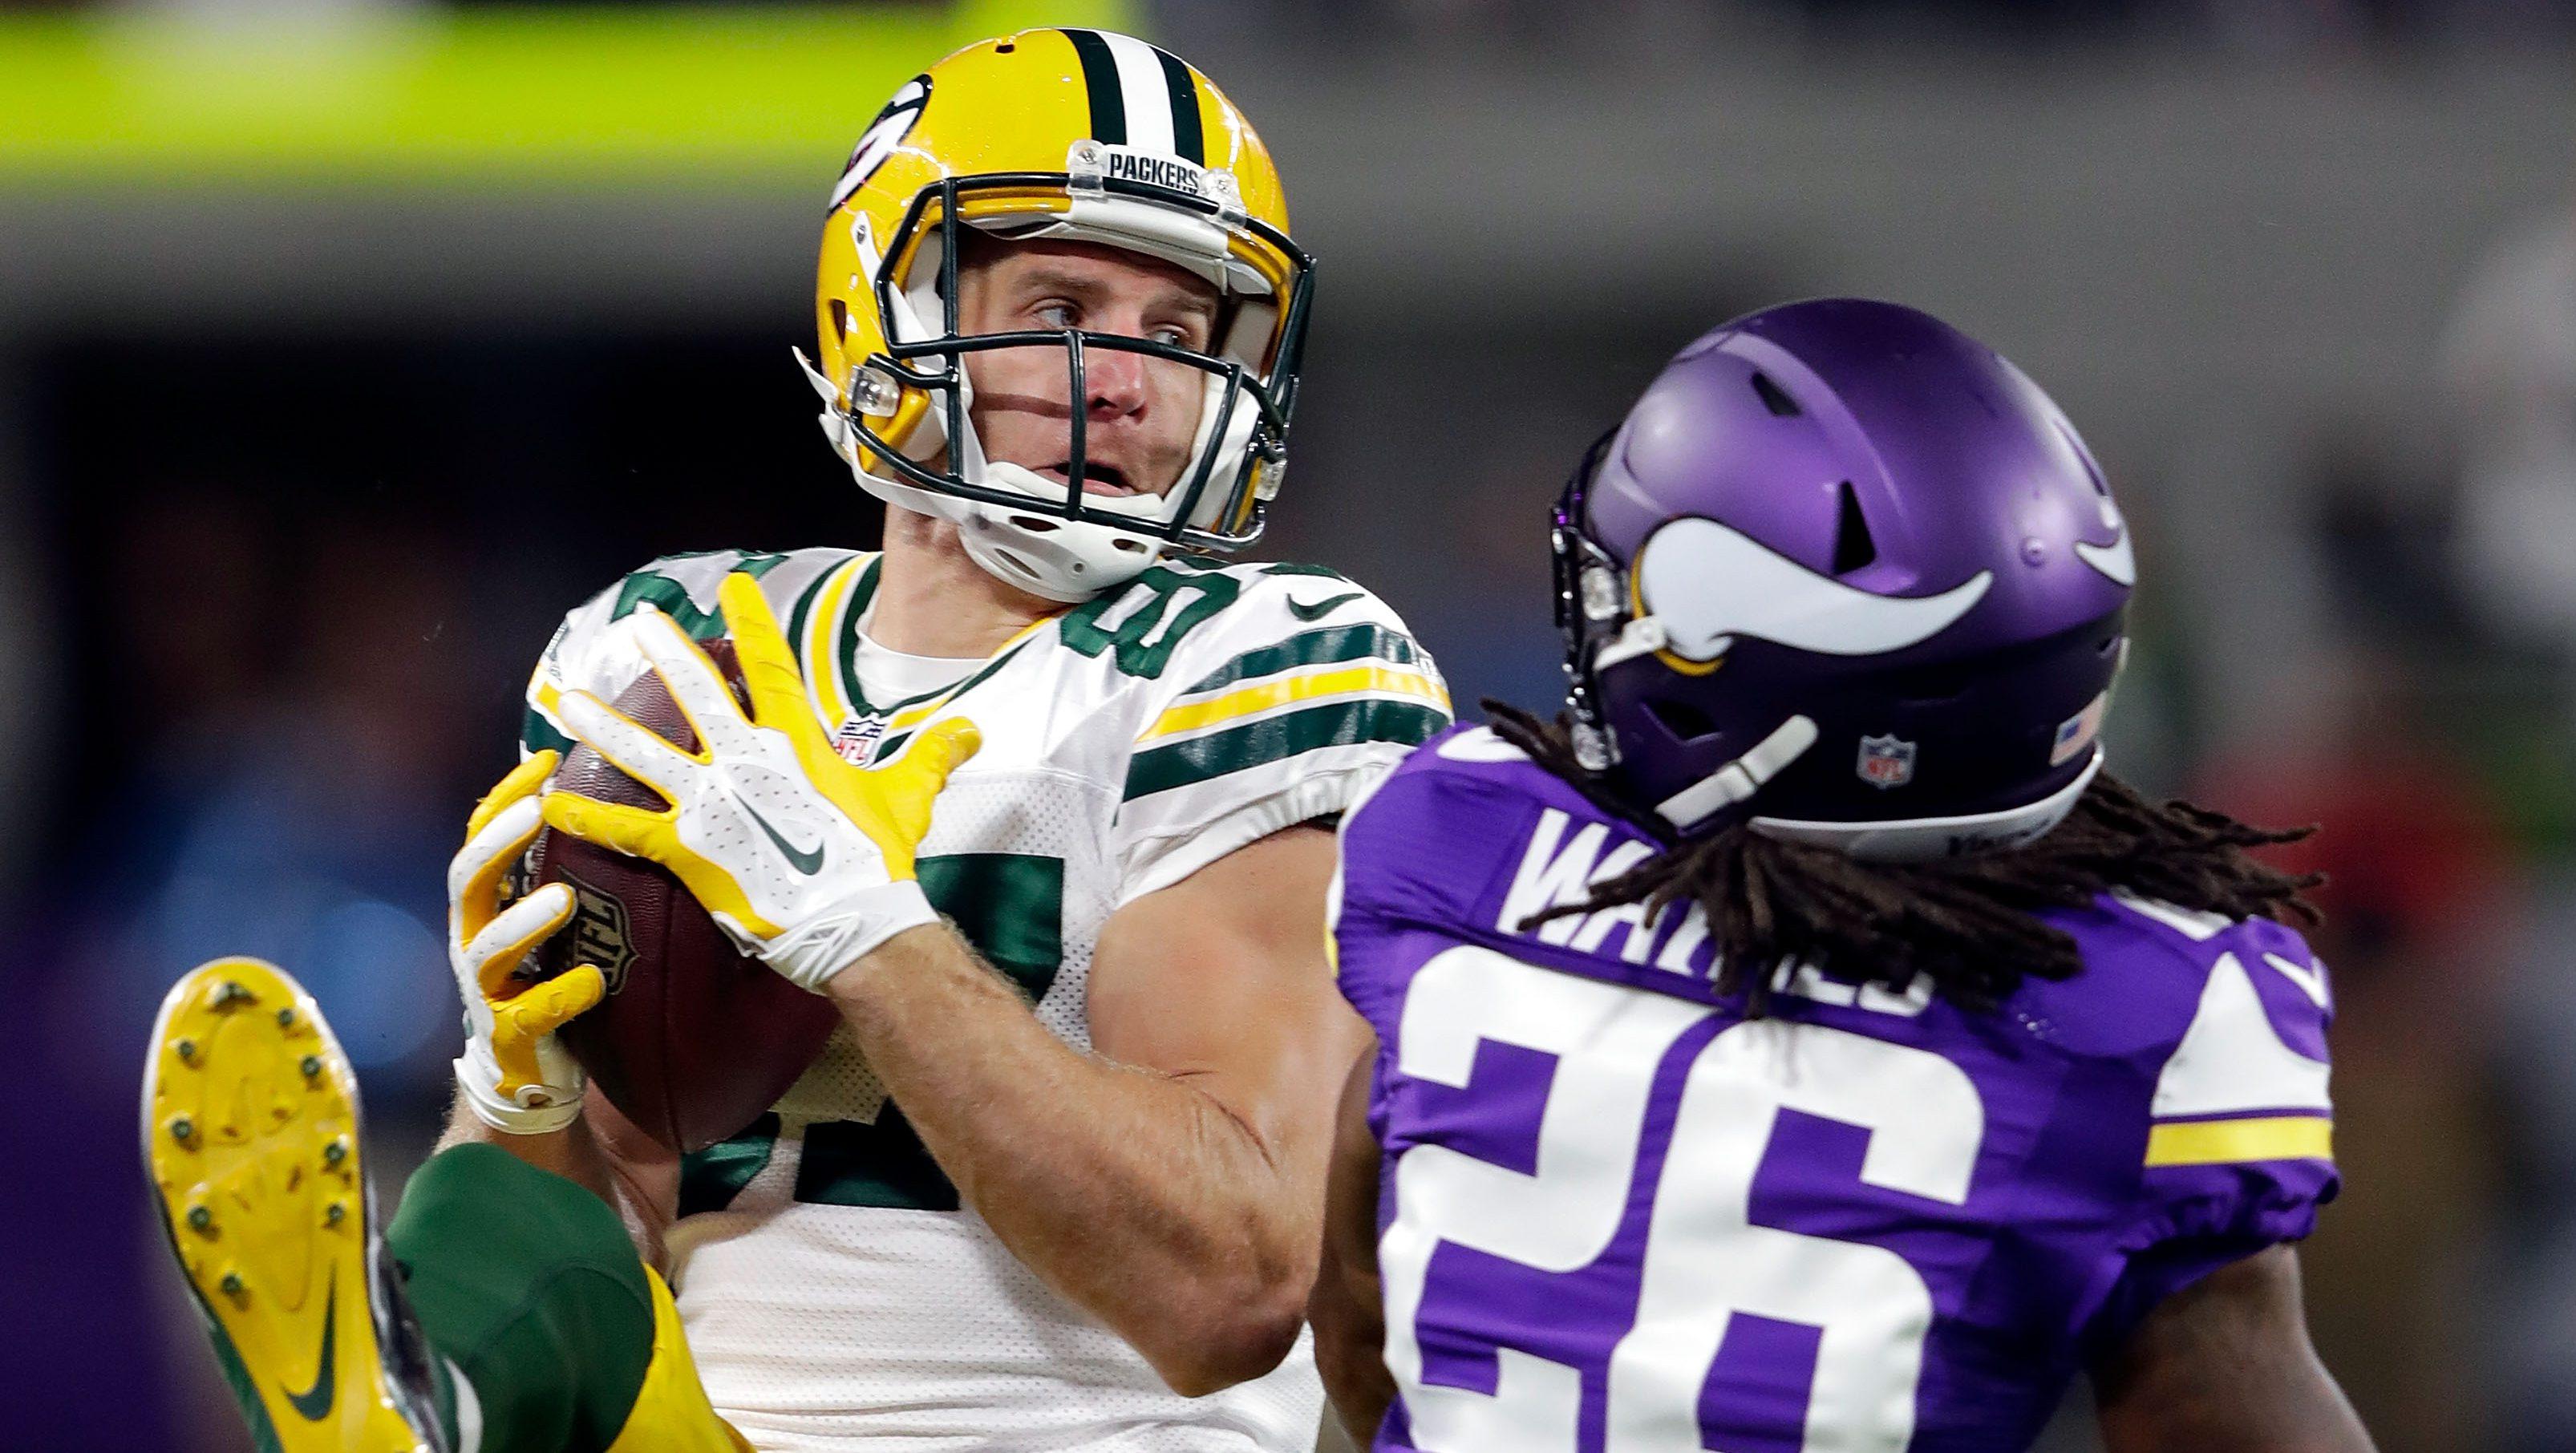 Vikings vs. Packers: Score, Stats & Highlights | Heavy.com